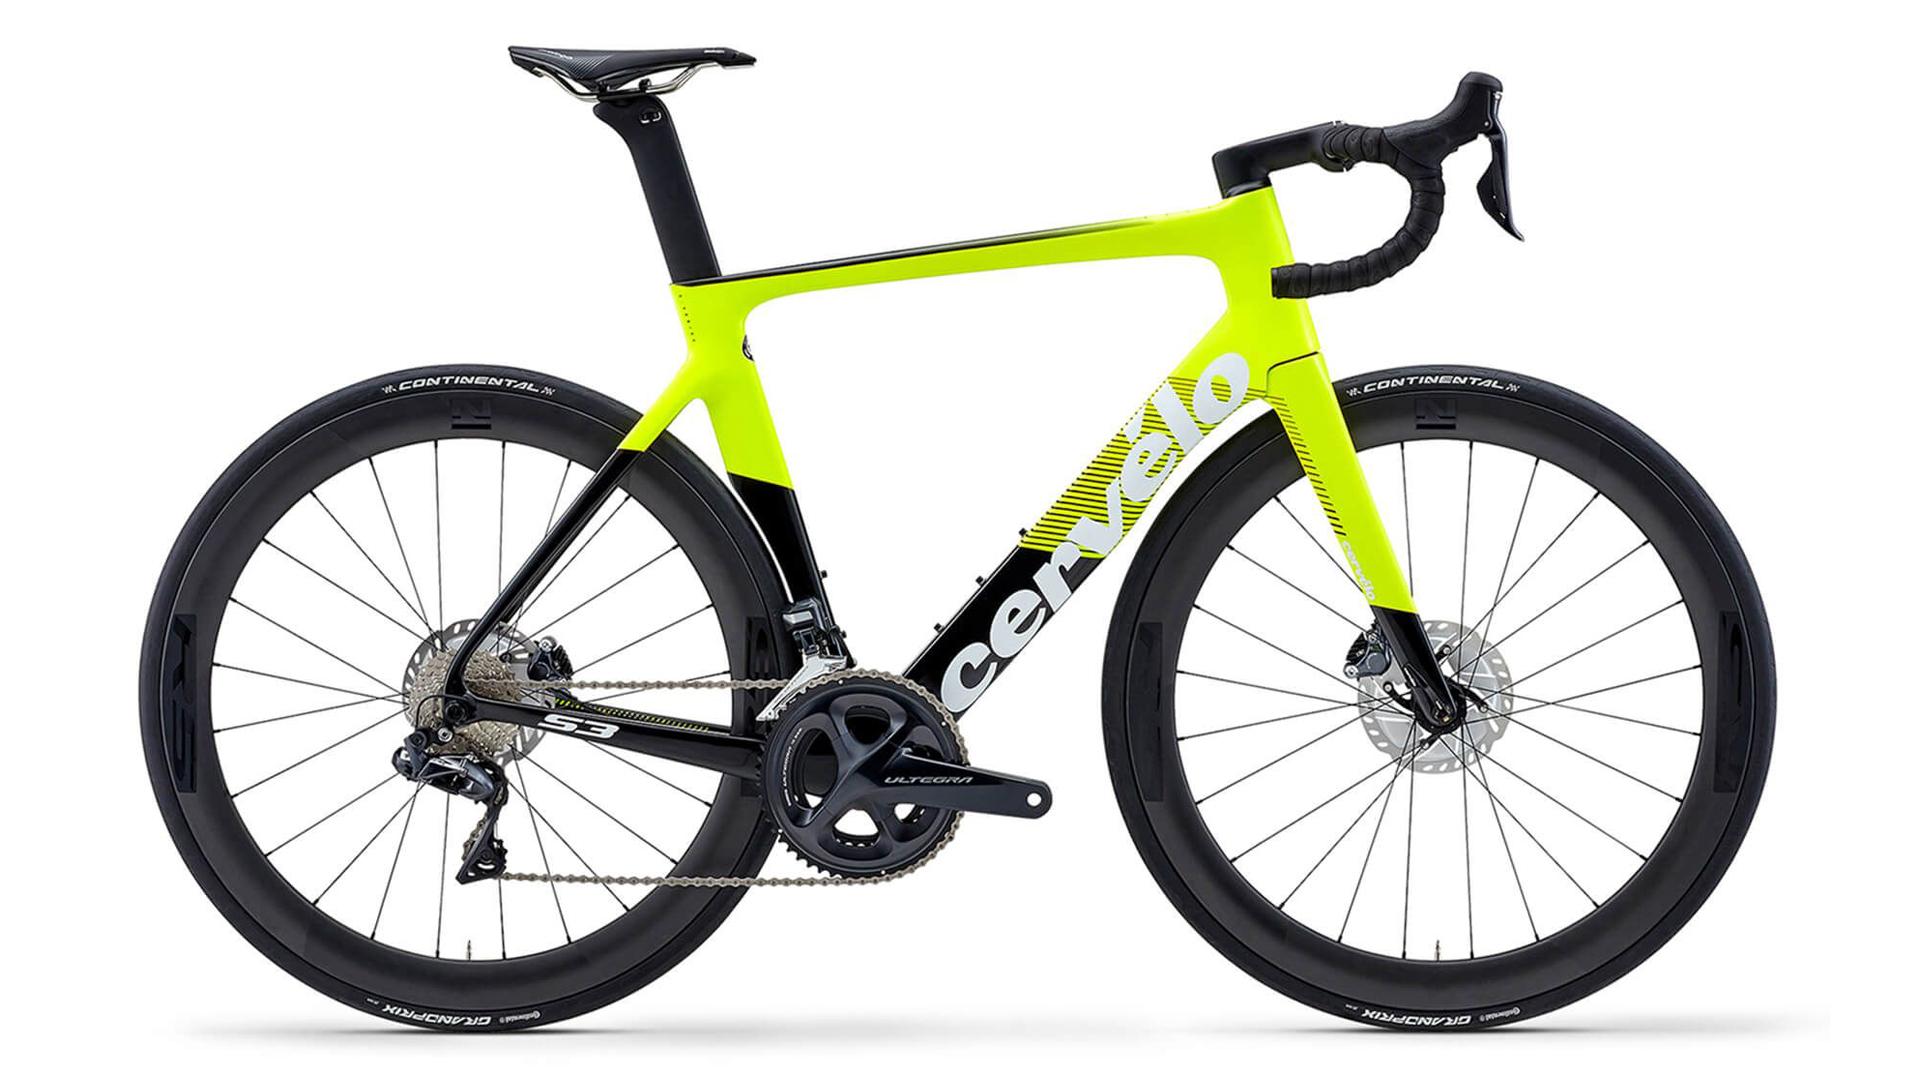 Best aero road bikes: Cervelo S3 Ultegra